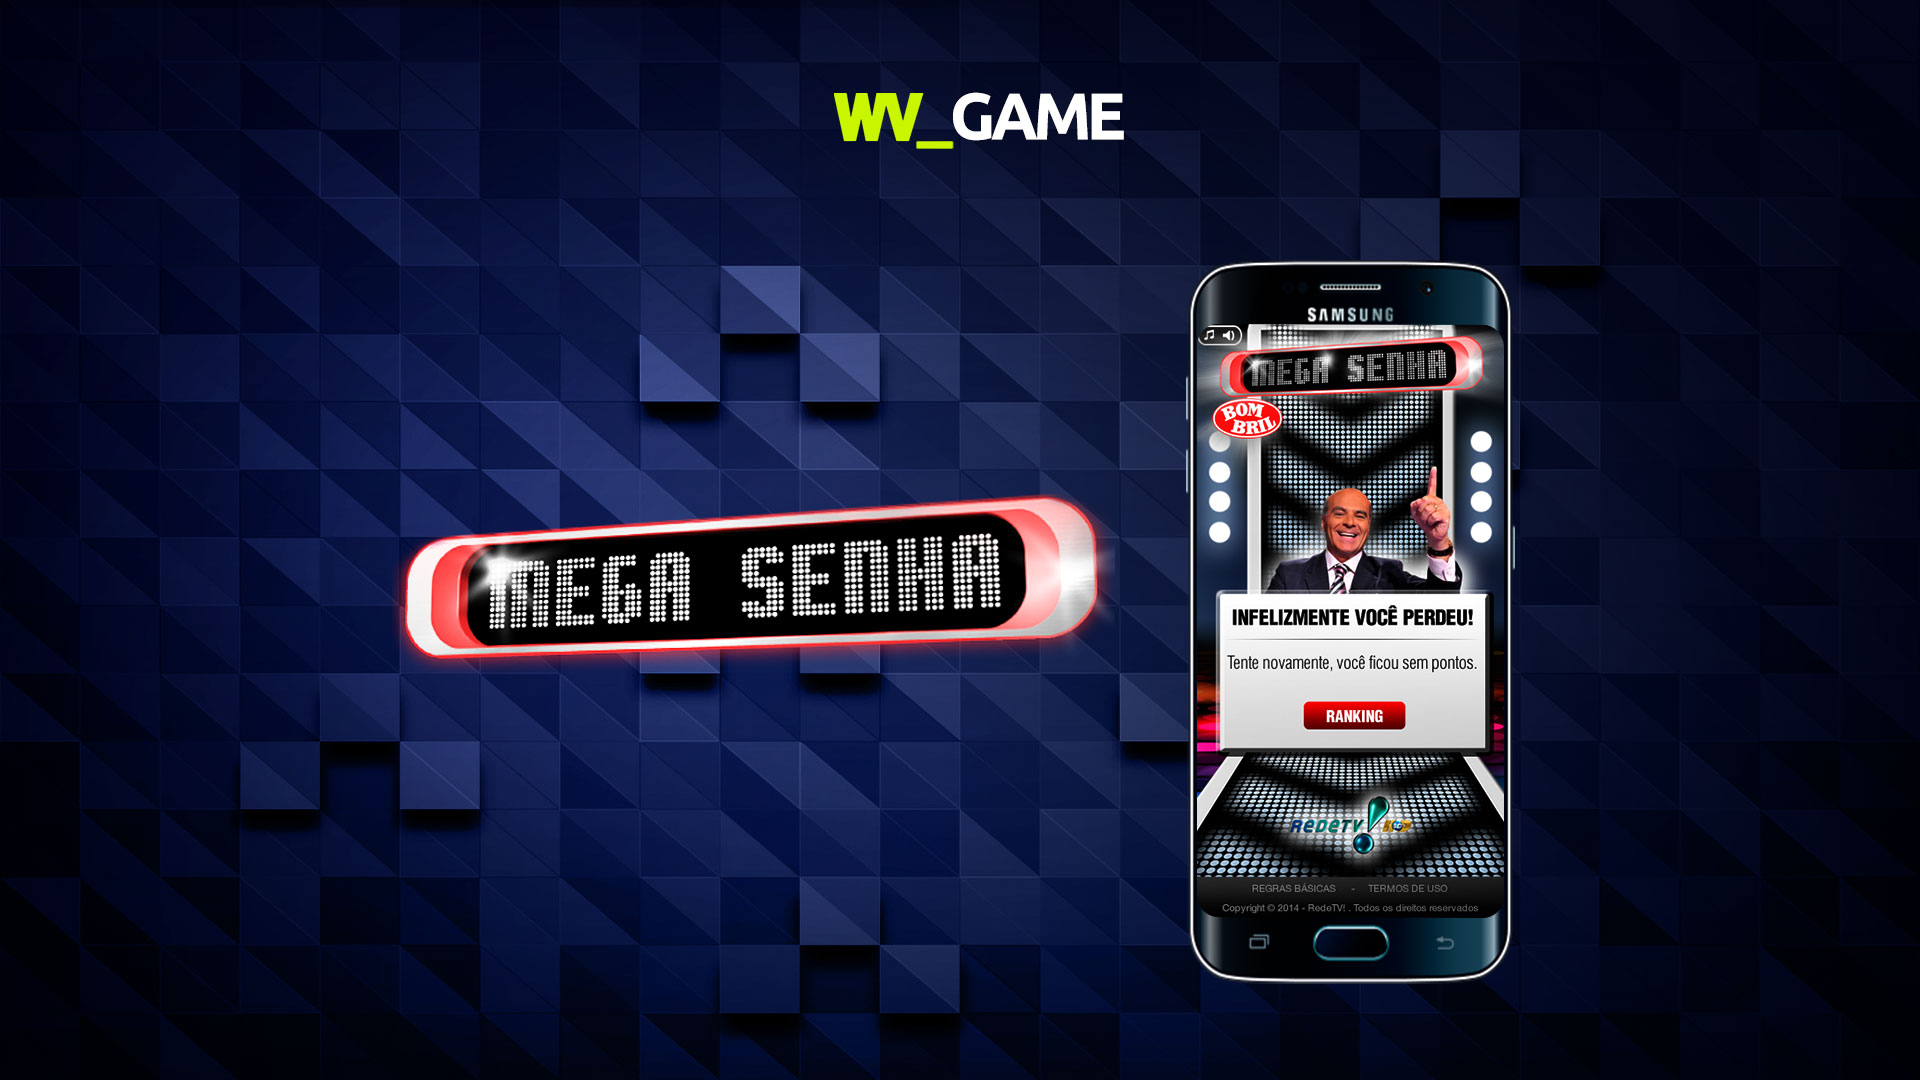 WV-Todoz-Game-Mega-Senha